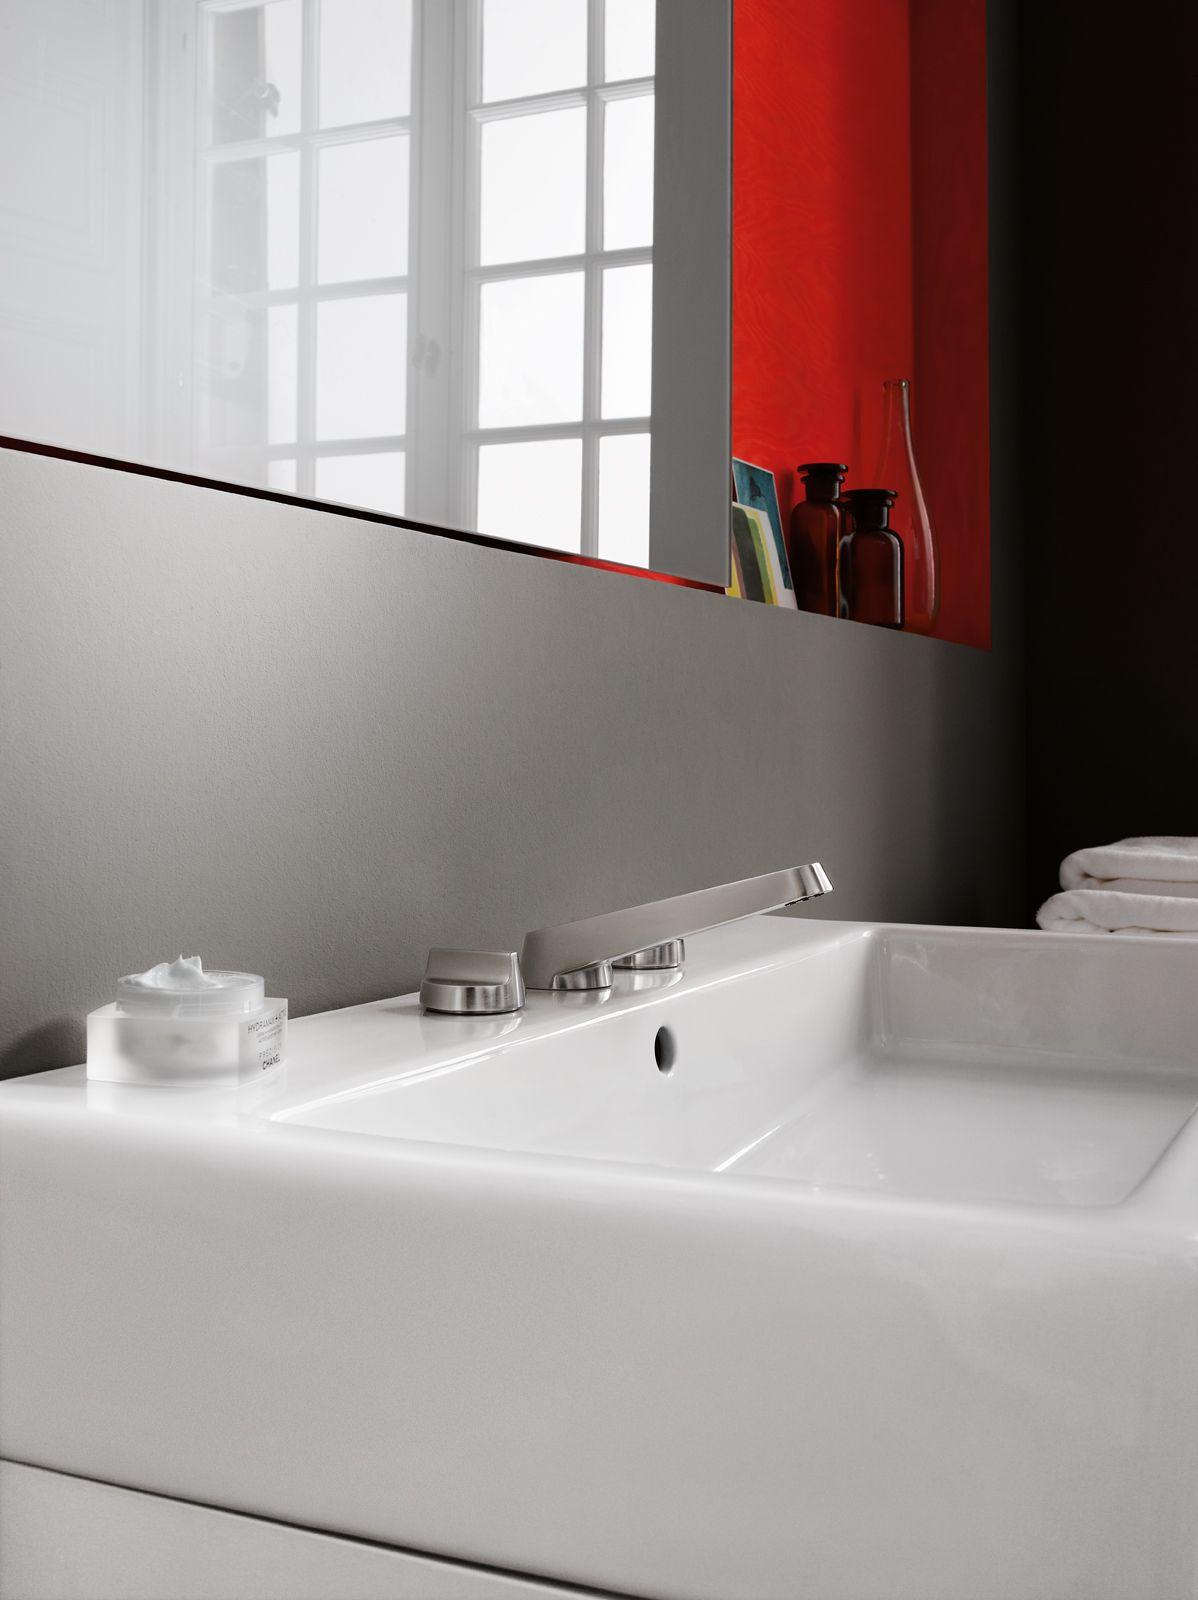 Selv Bad Spa Armatur Dornbracht Bath Design Dornbracht Basin Mixer